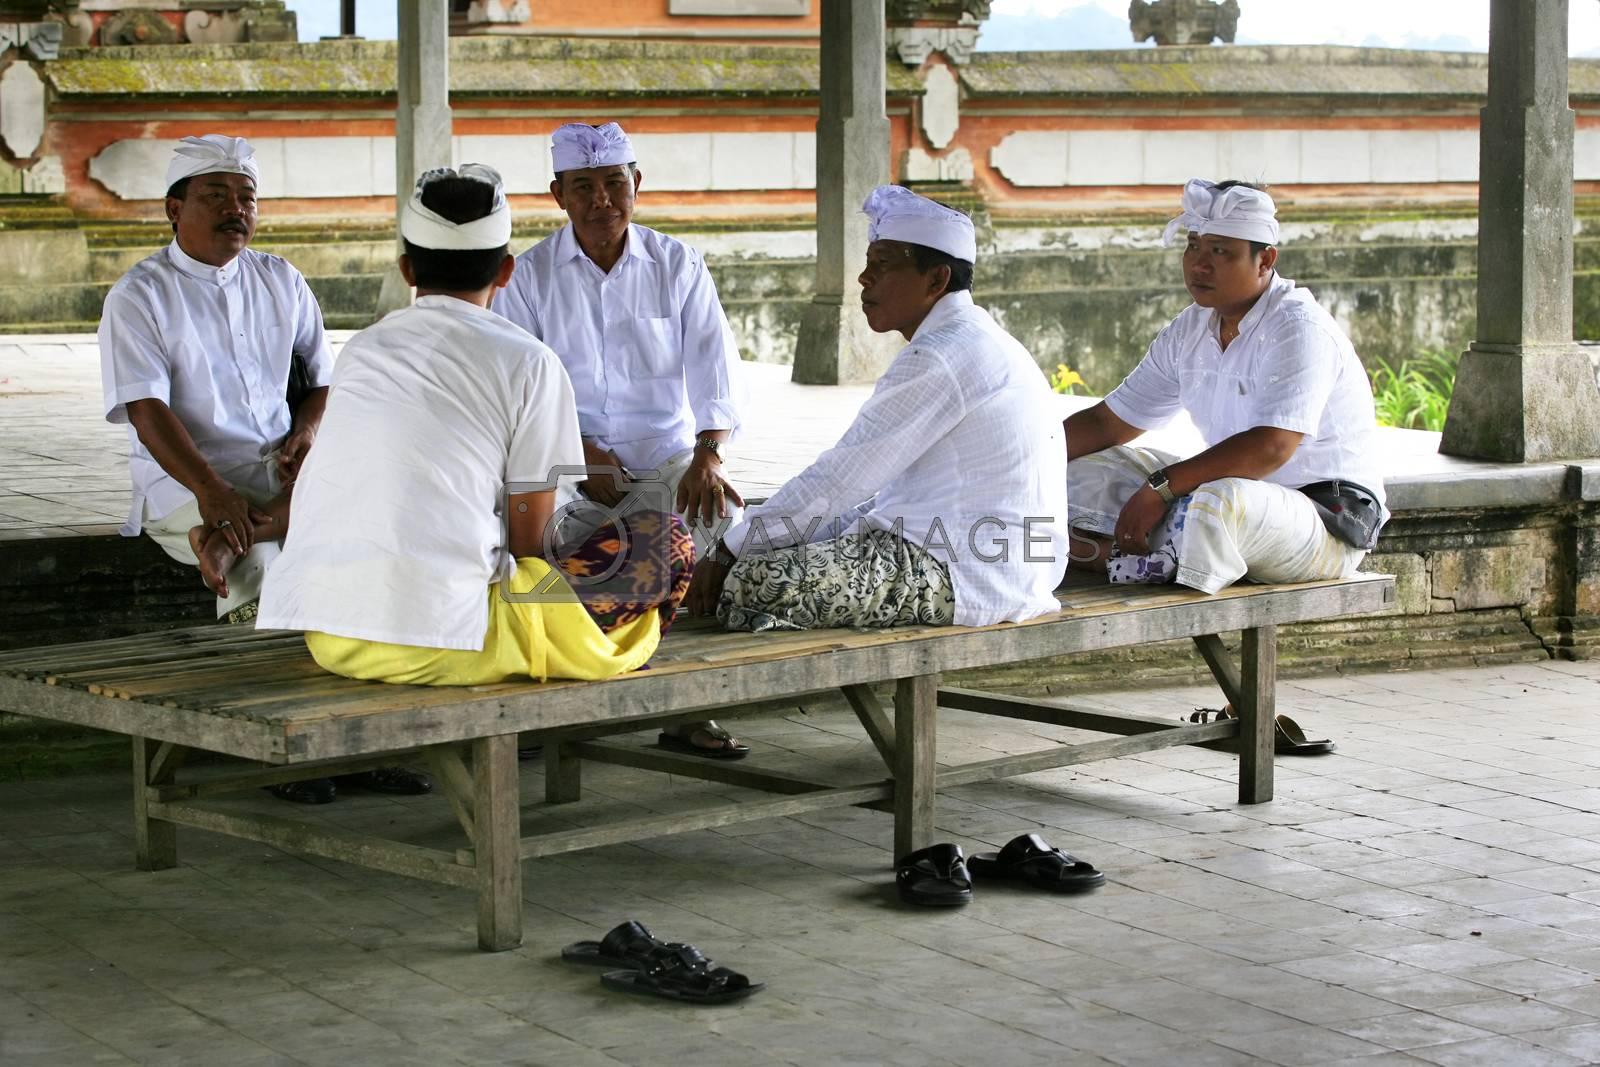 Ubud, Bali, Indonesia - November 09, 2008 : Buddhist monks in Ulun Danu Temple on Bali